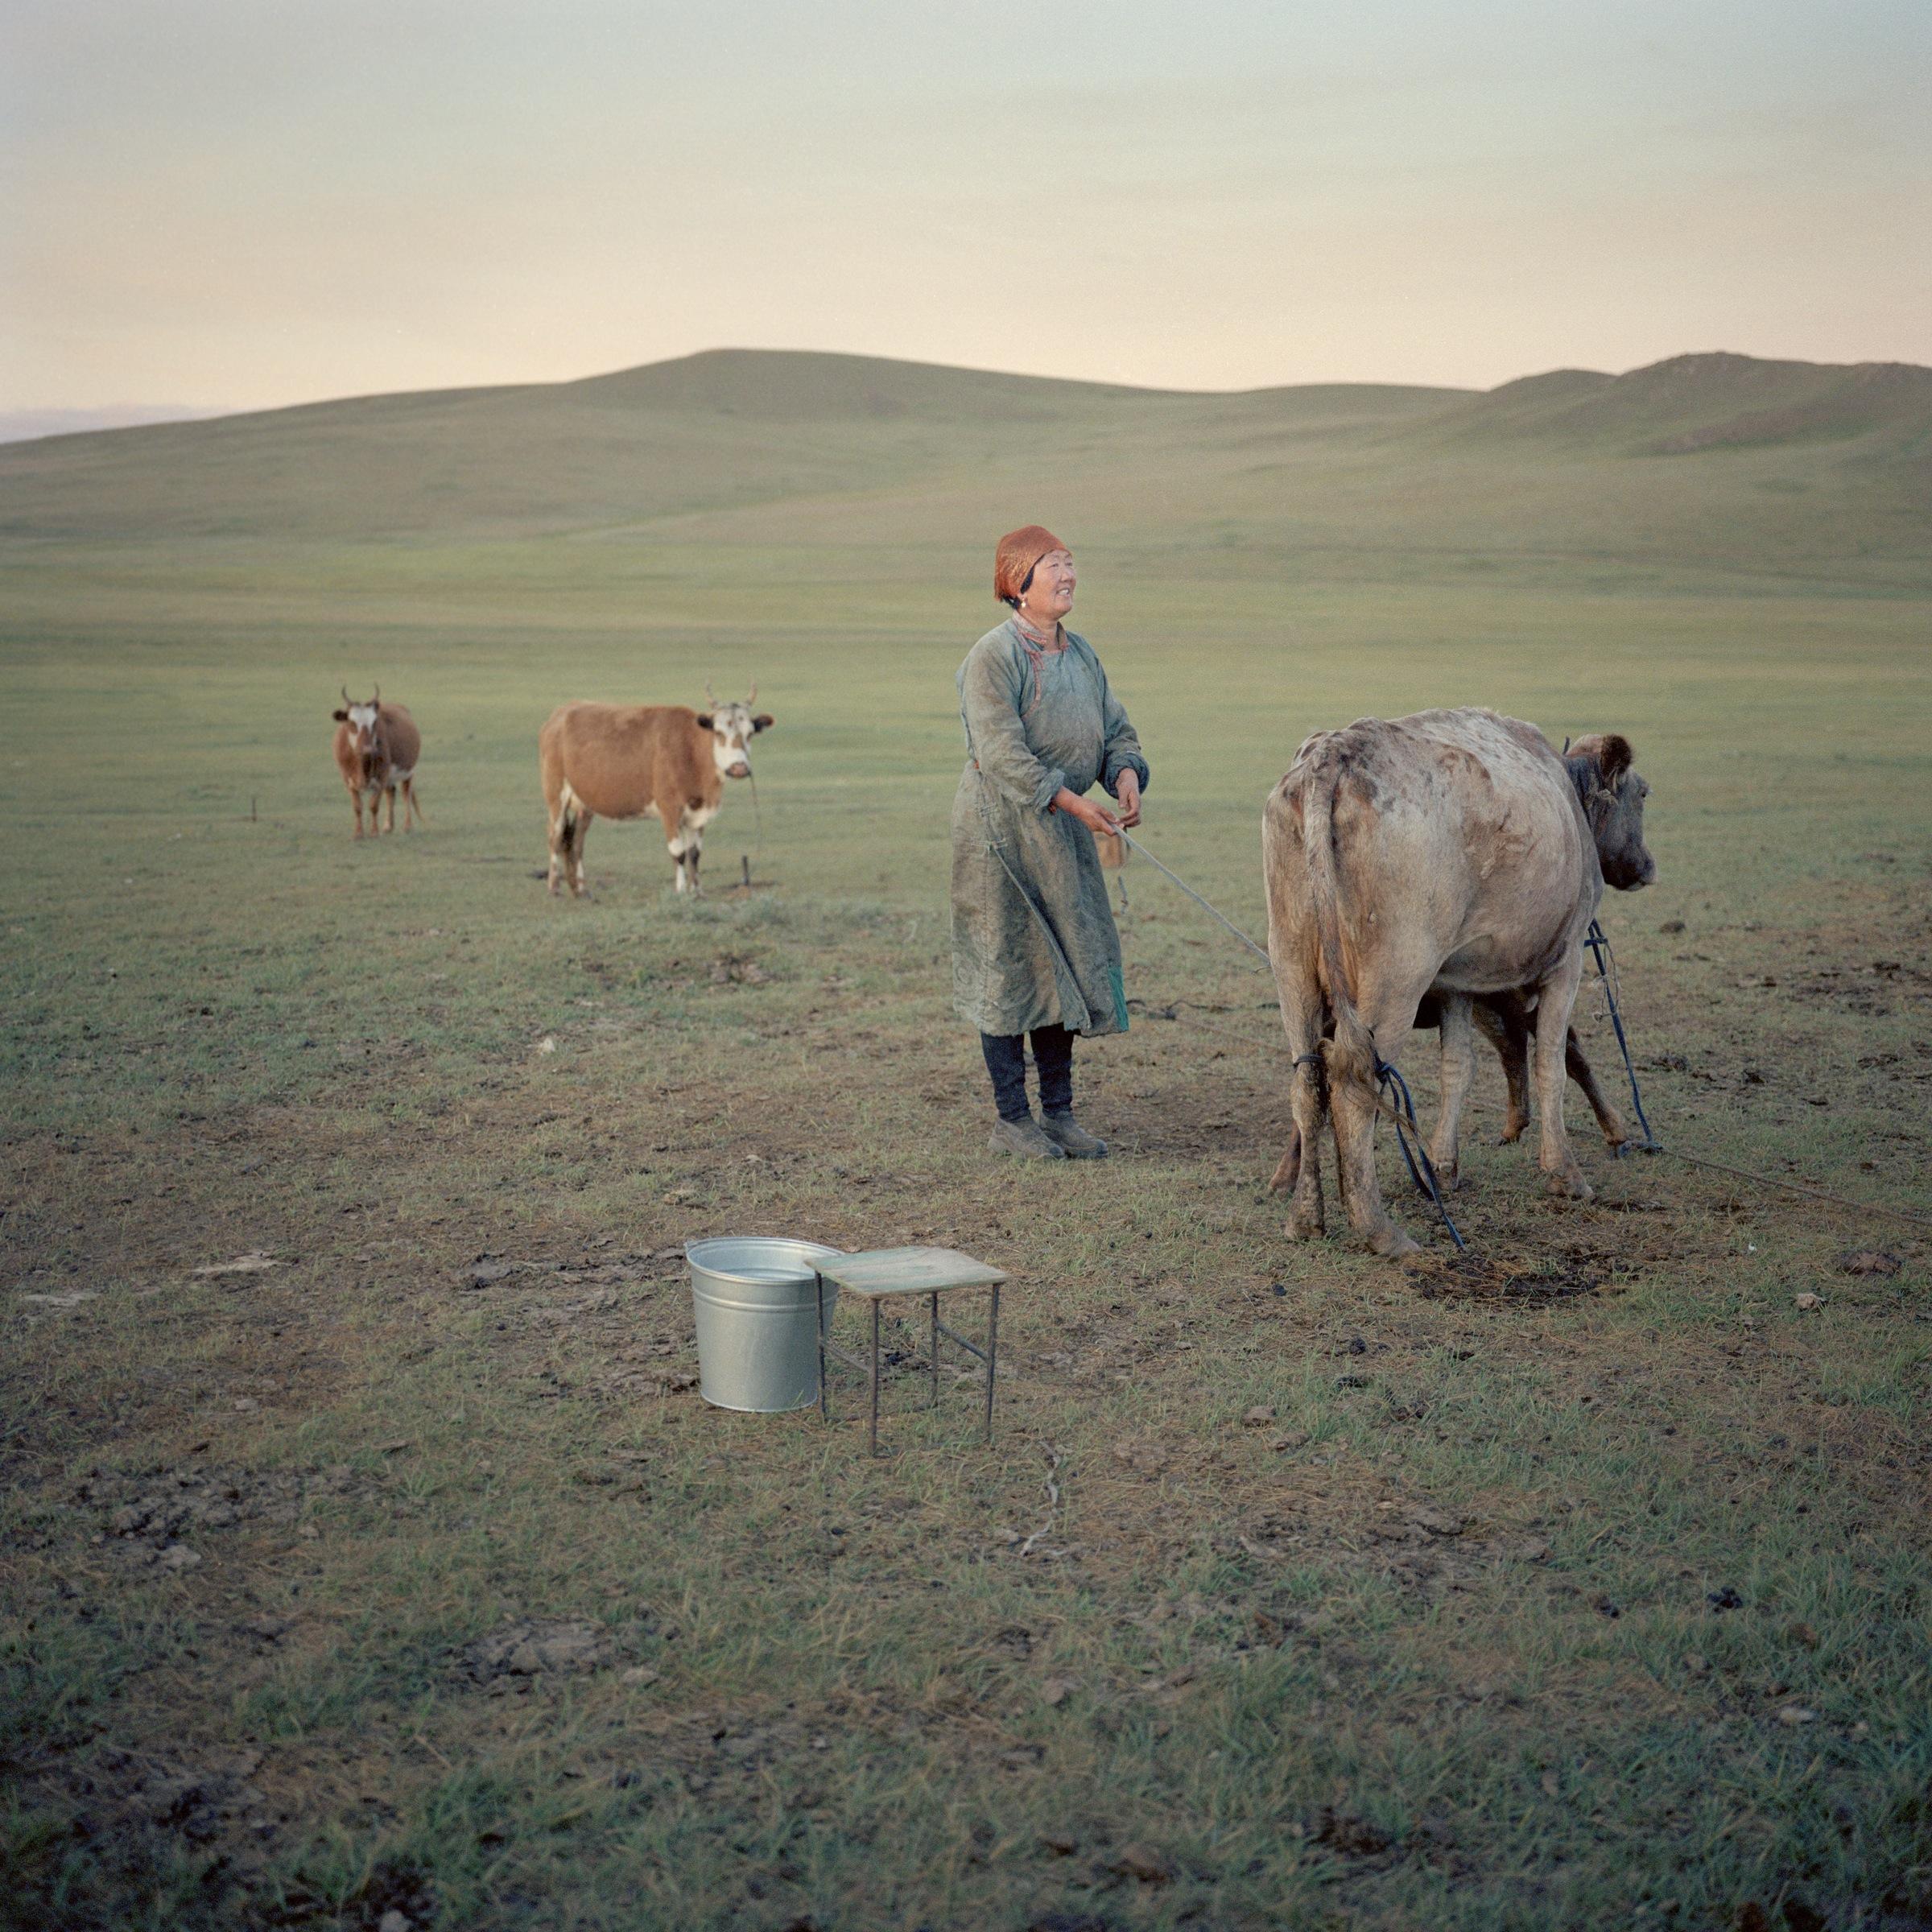 Goia_Mongolia_07.jpg